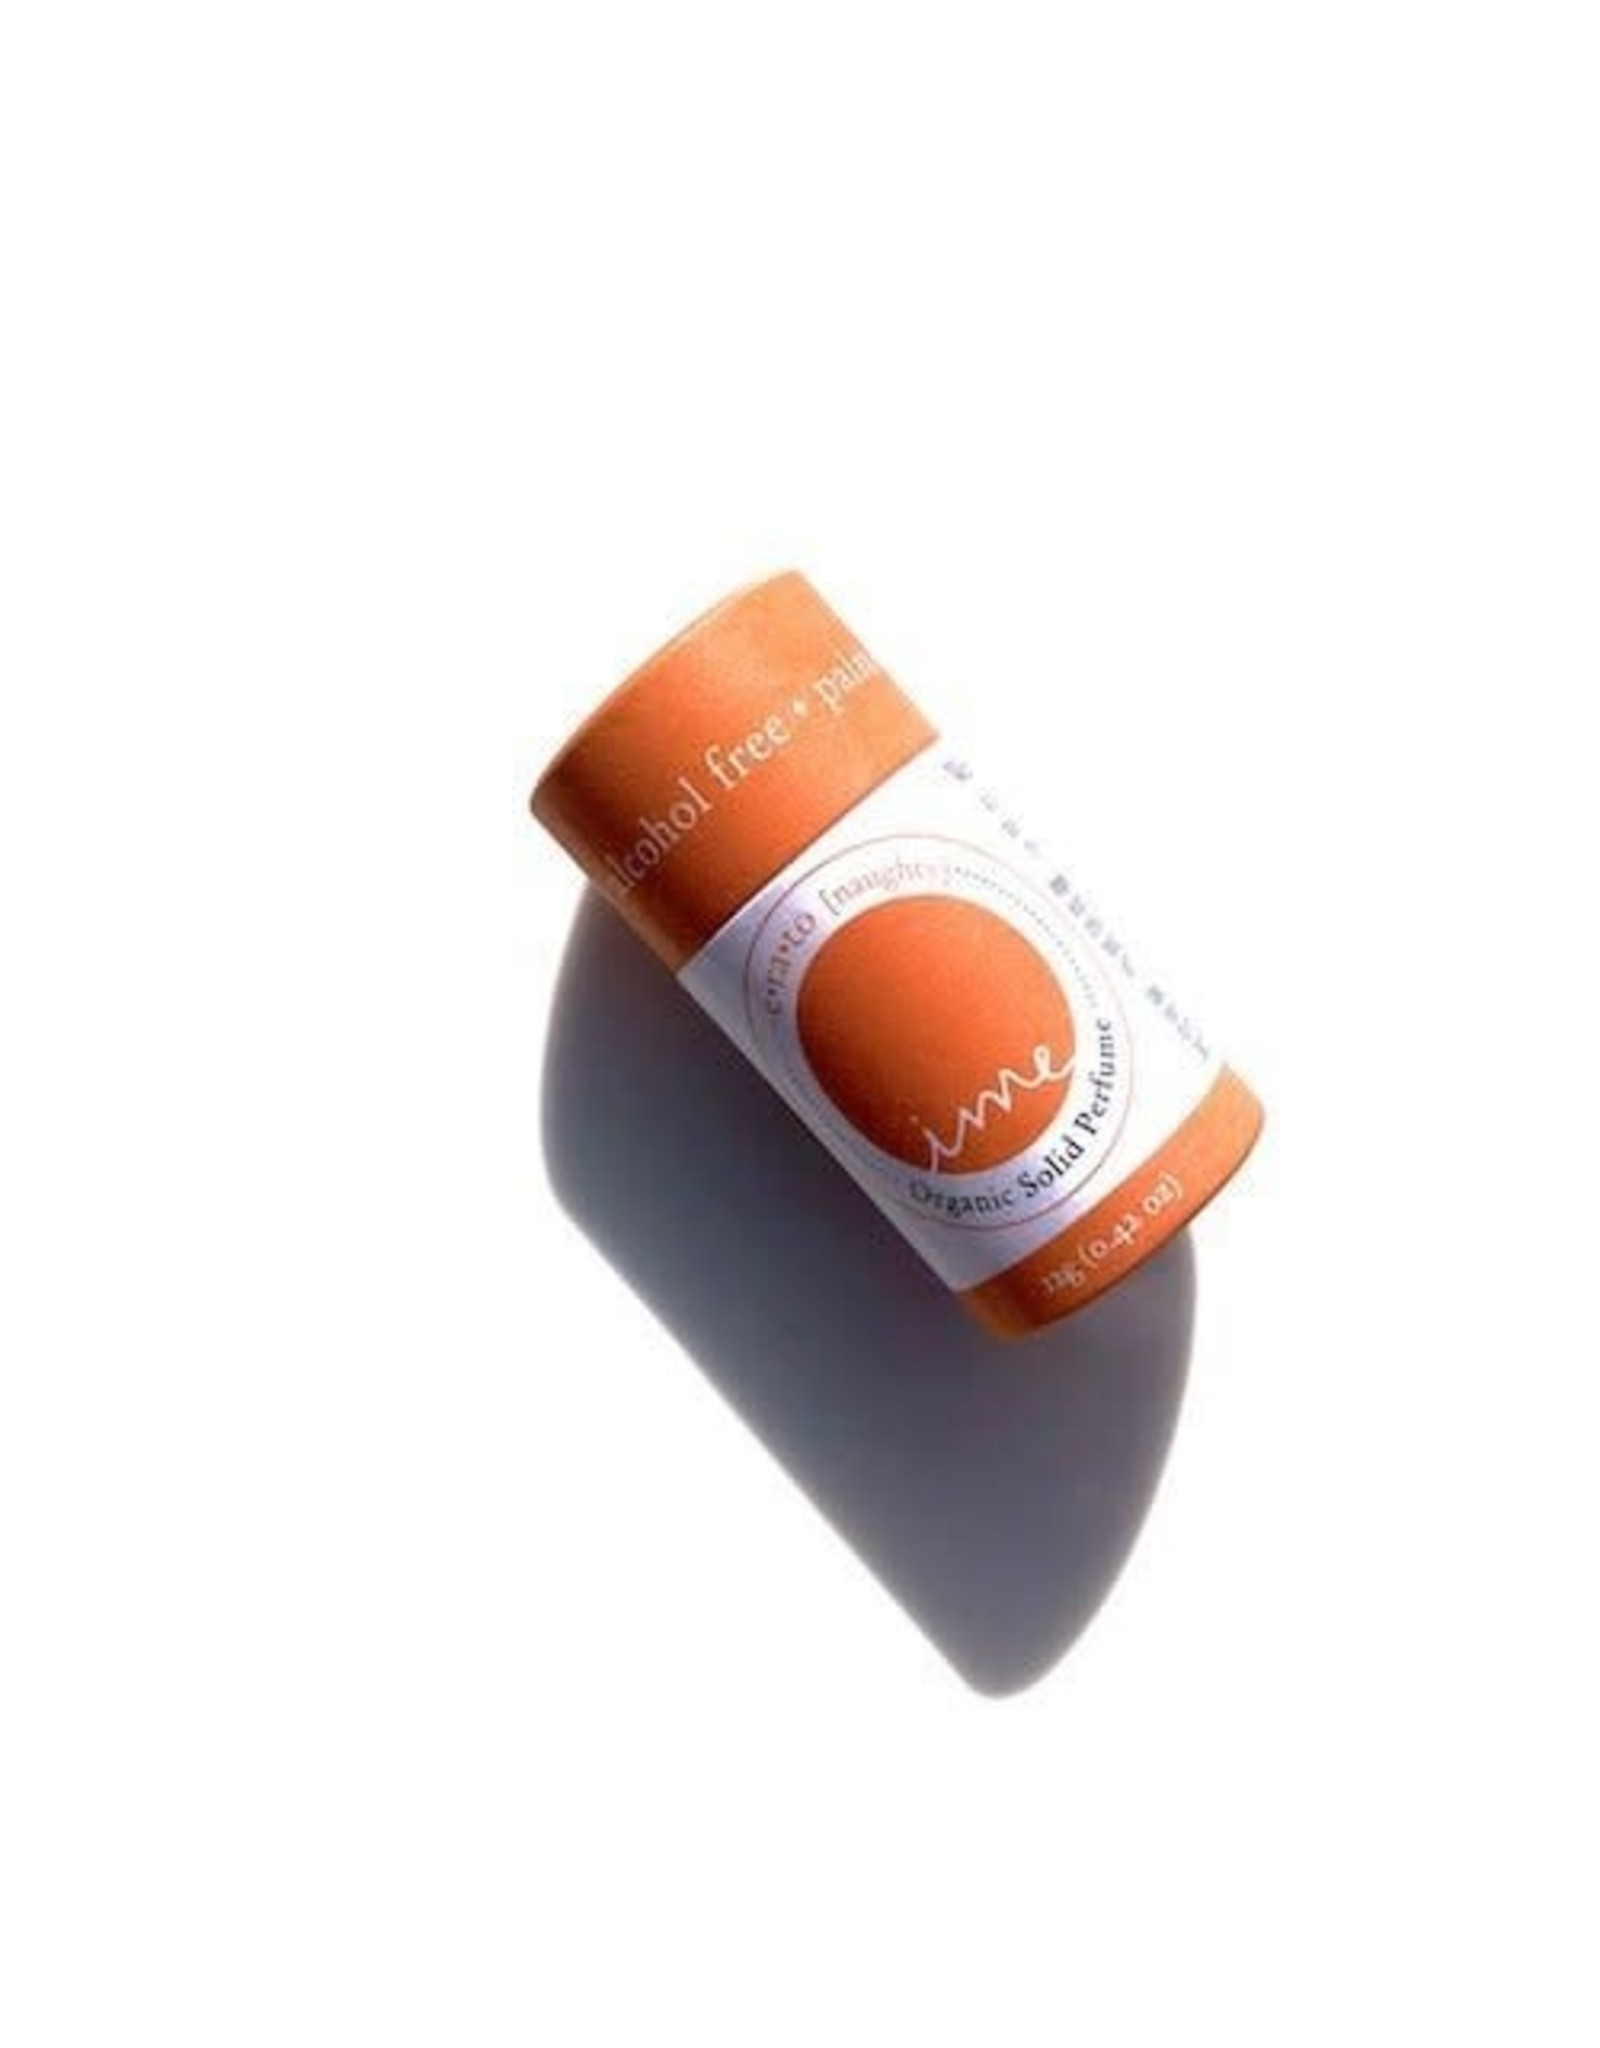 IME Solid Perfume - Erato (Naughty) - 12g